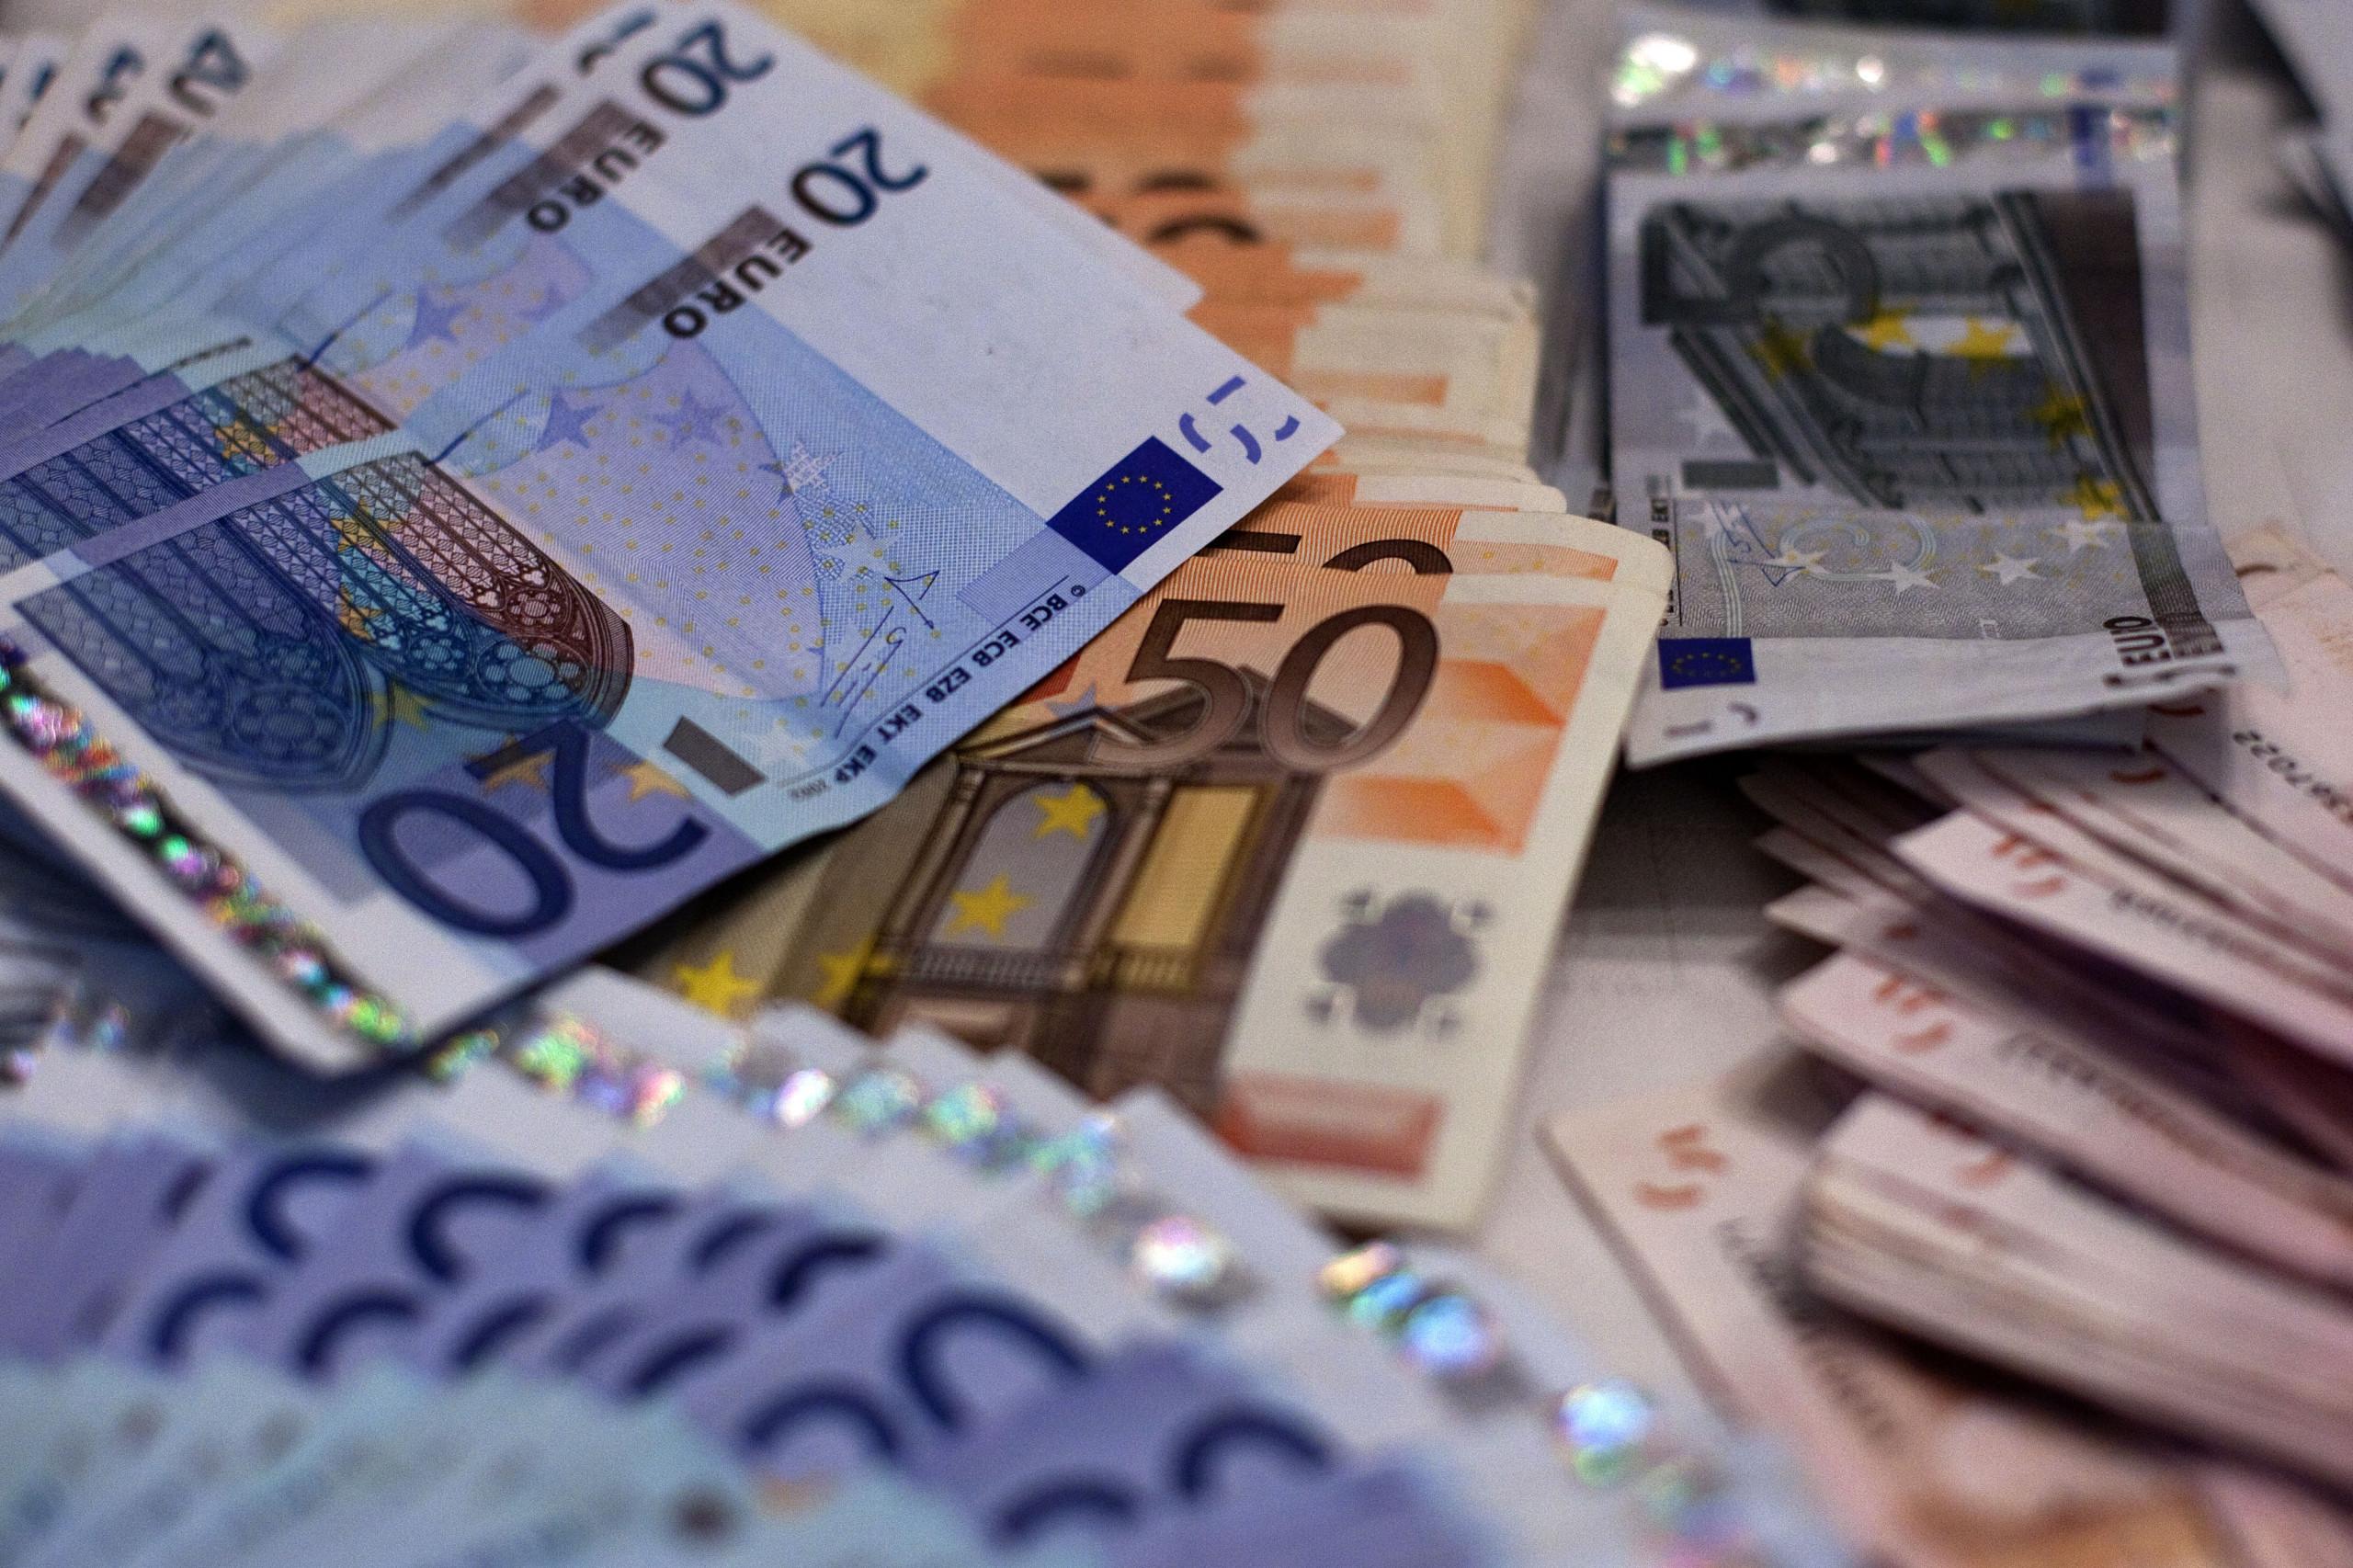 Governo projeta descida da carga fiscal até 2023